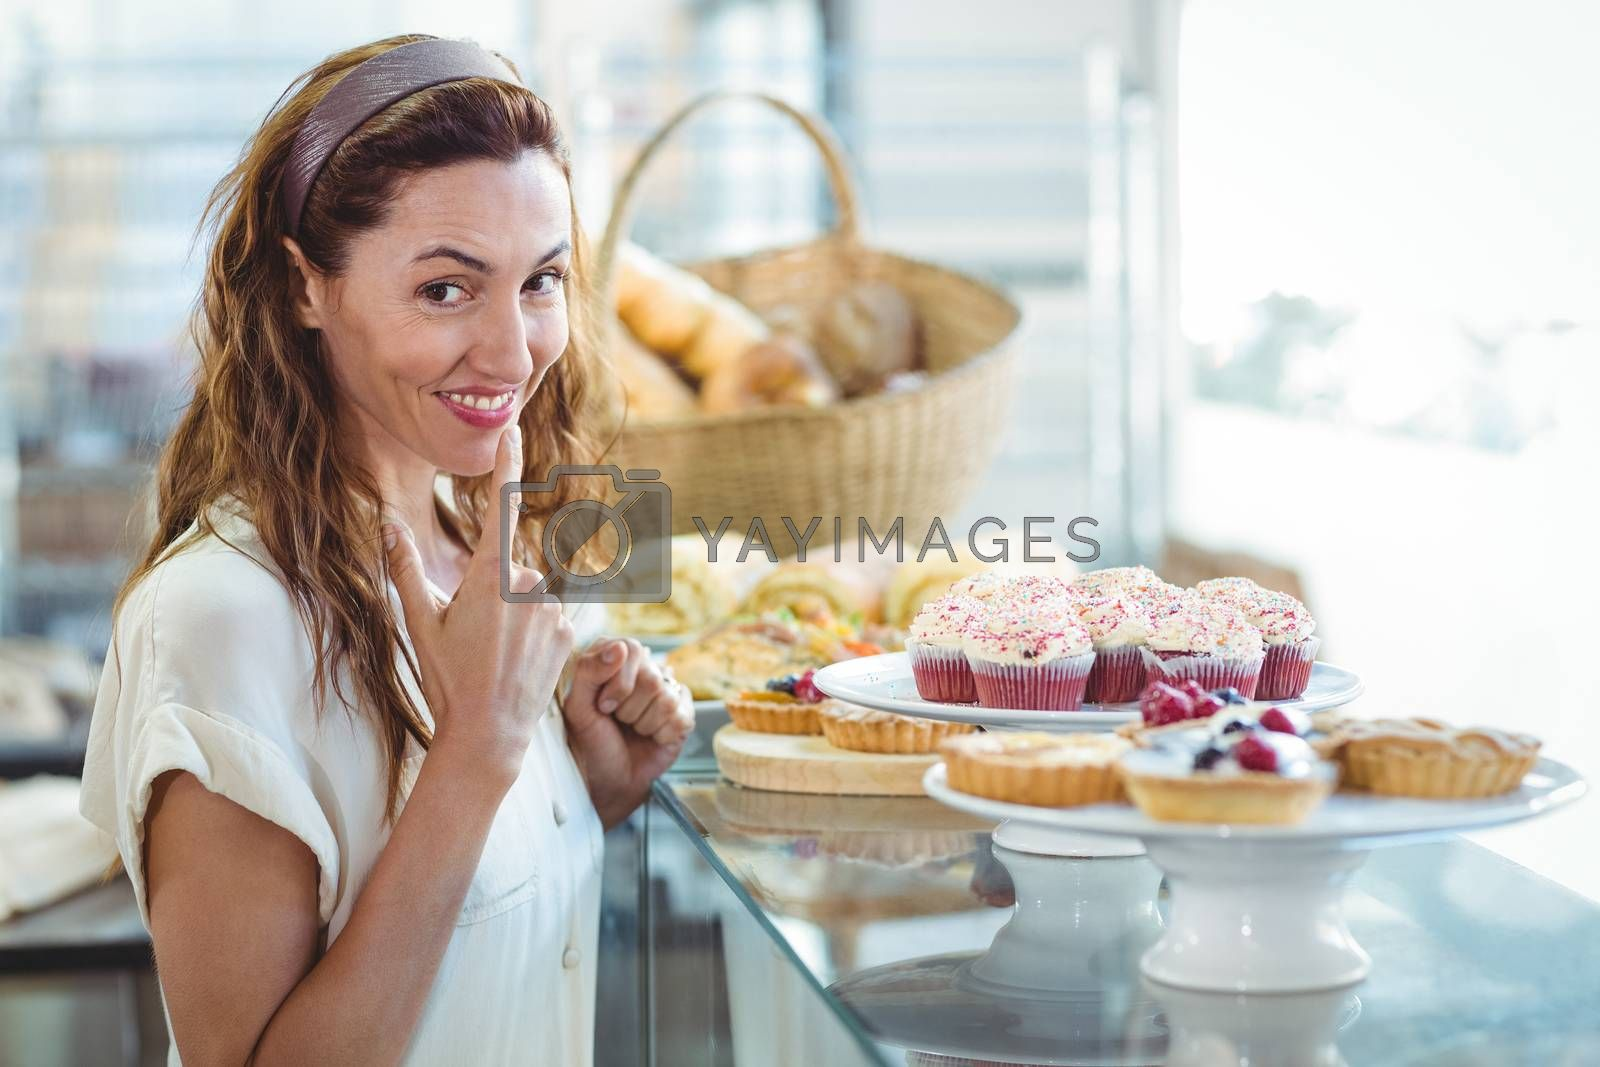 Royalty free image of Hesitating pretty woman looking at camera by Wavebreakmedia